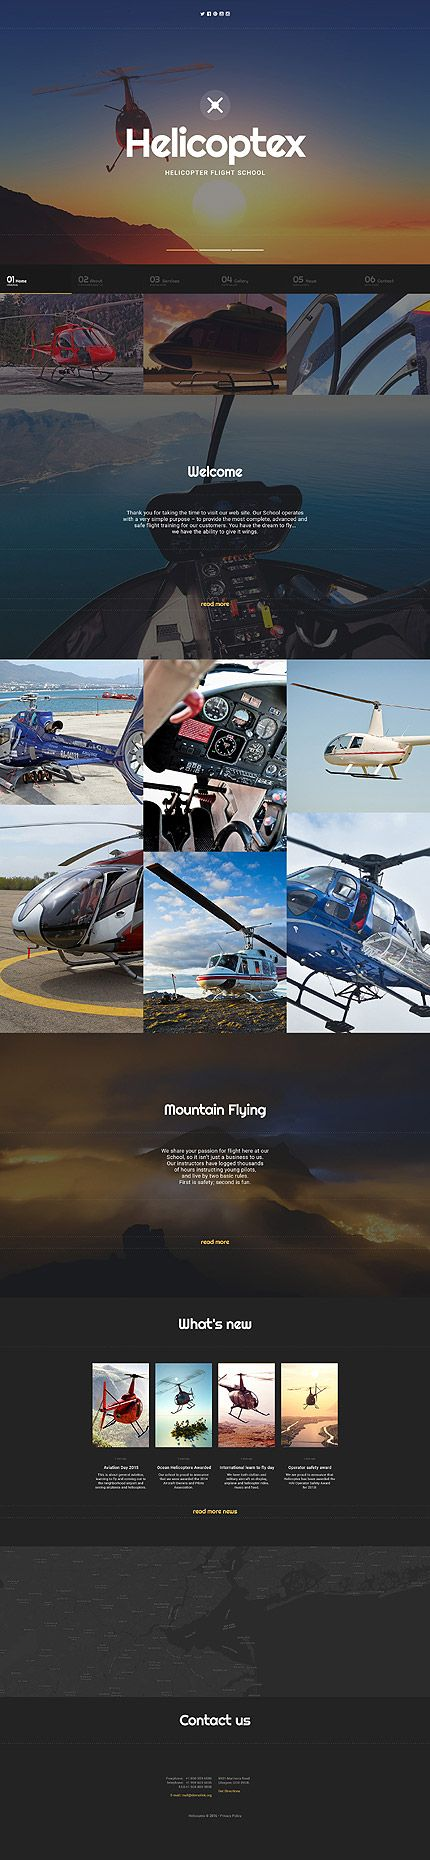 Template 58630 - Helicoptex Flight  Responsive Website Template